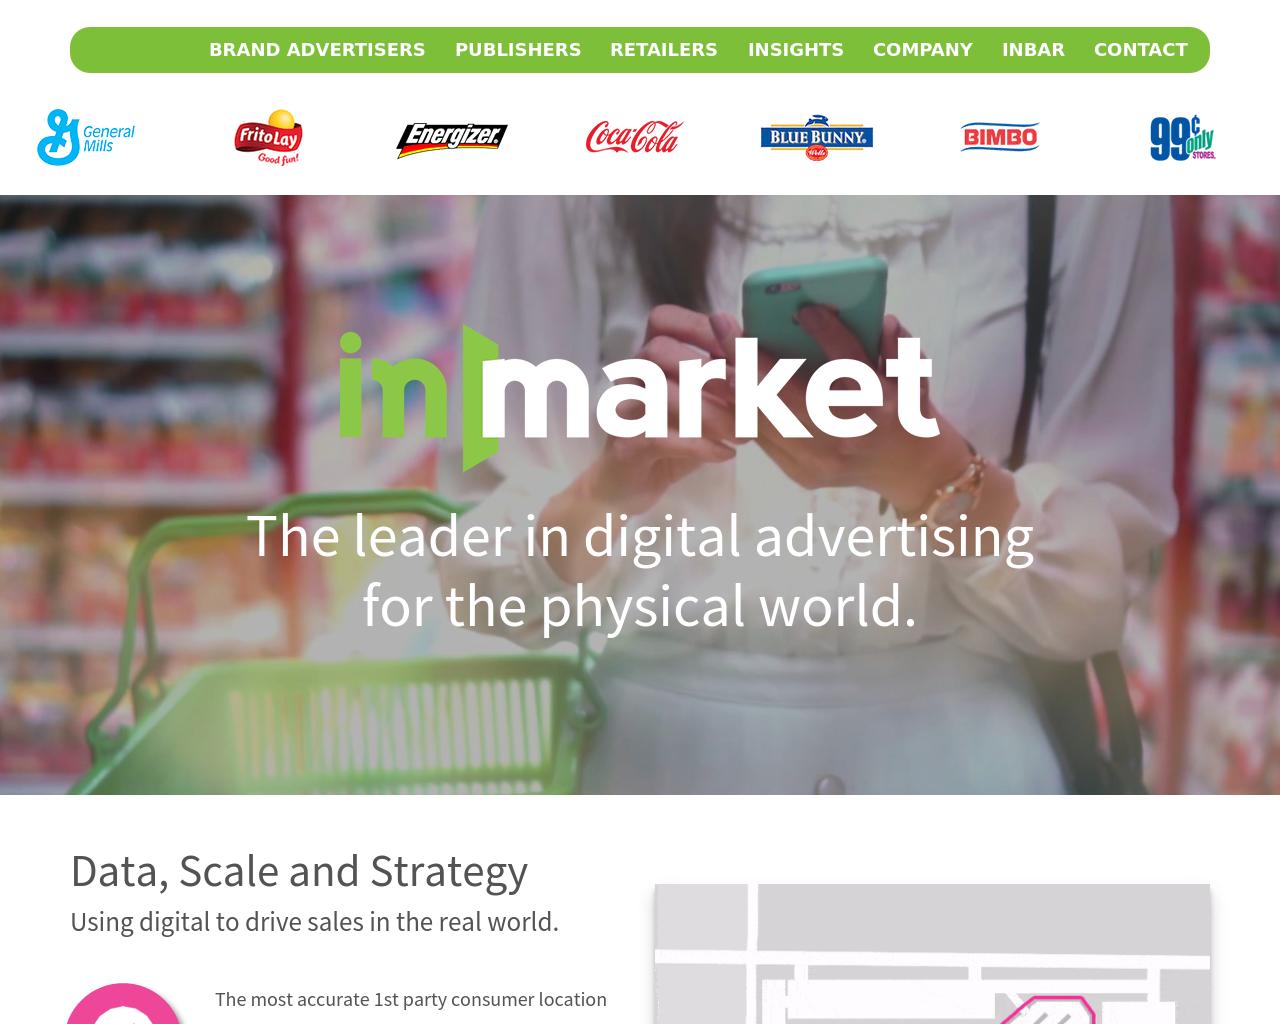 inMarket-Advertising-Reviews-Pricing